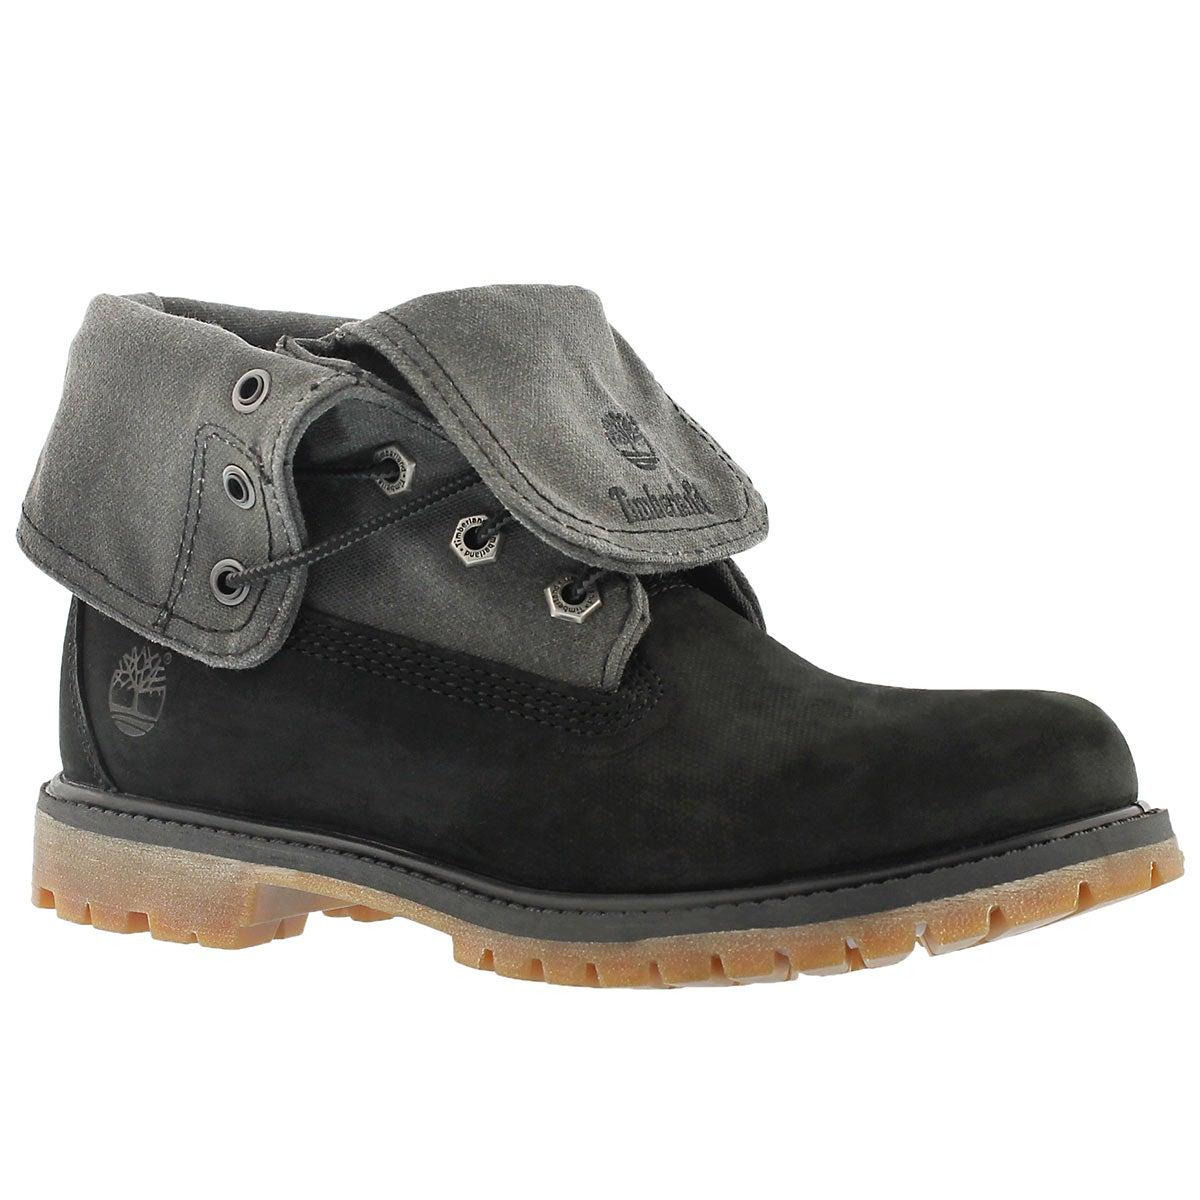 Lds Authentics black fold down boot